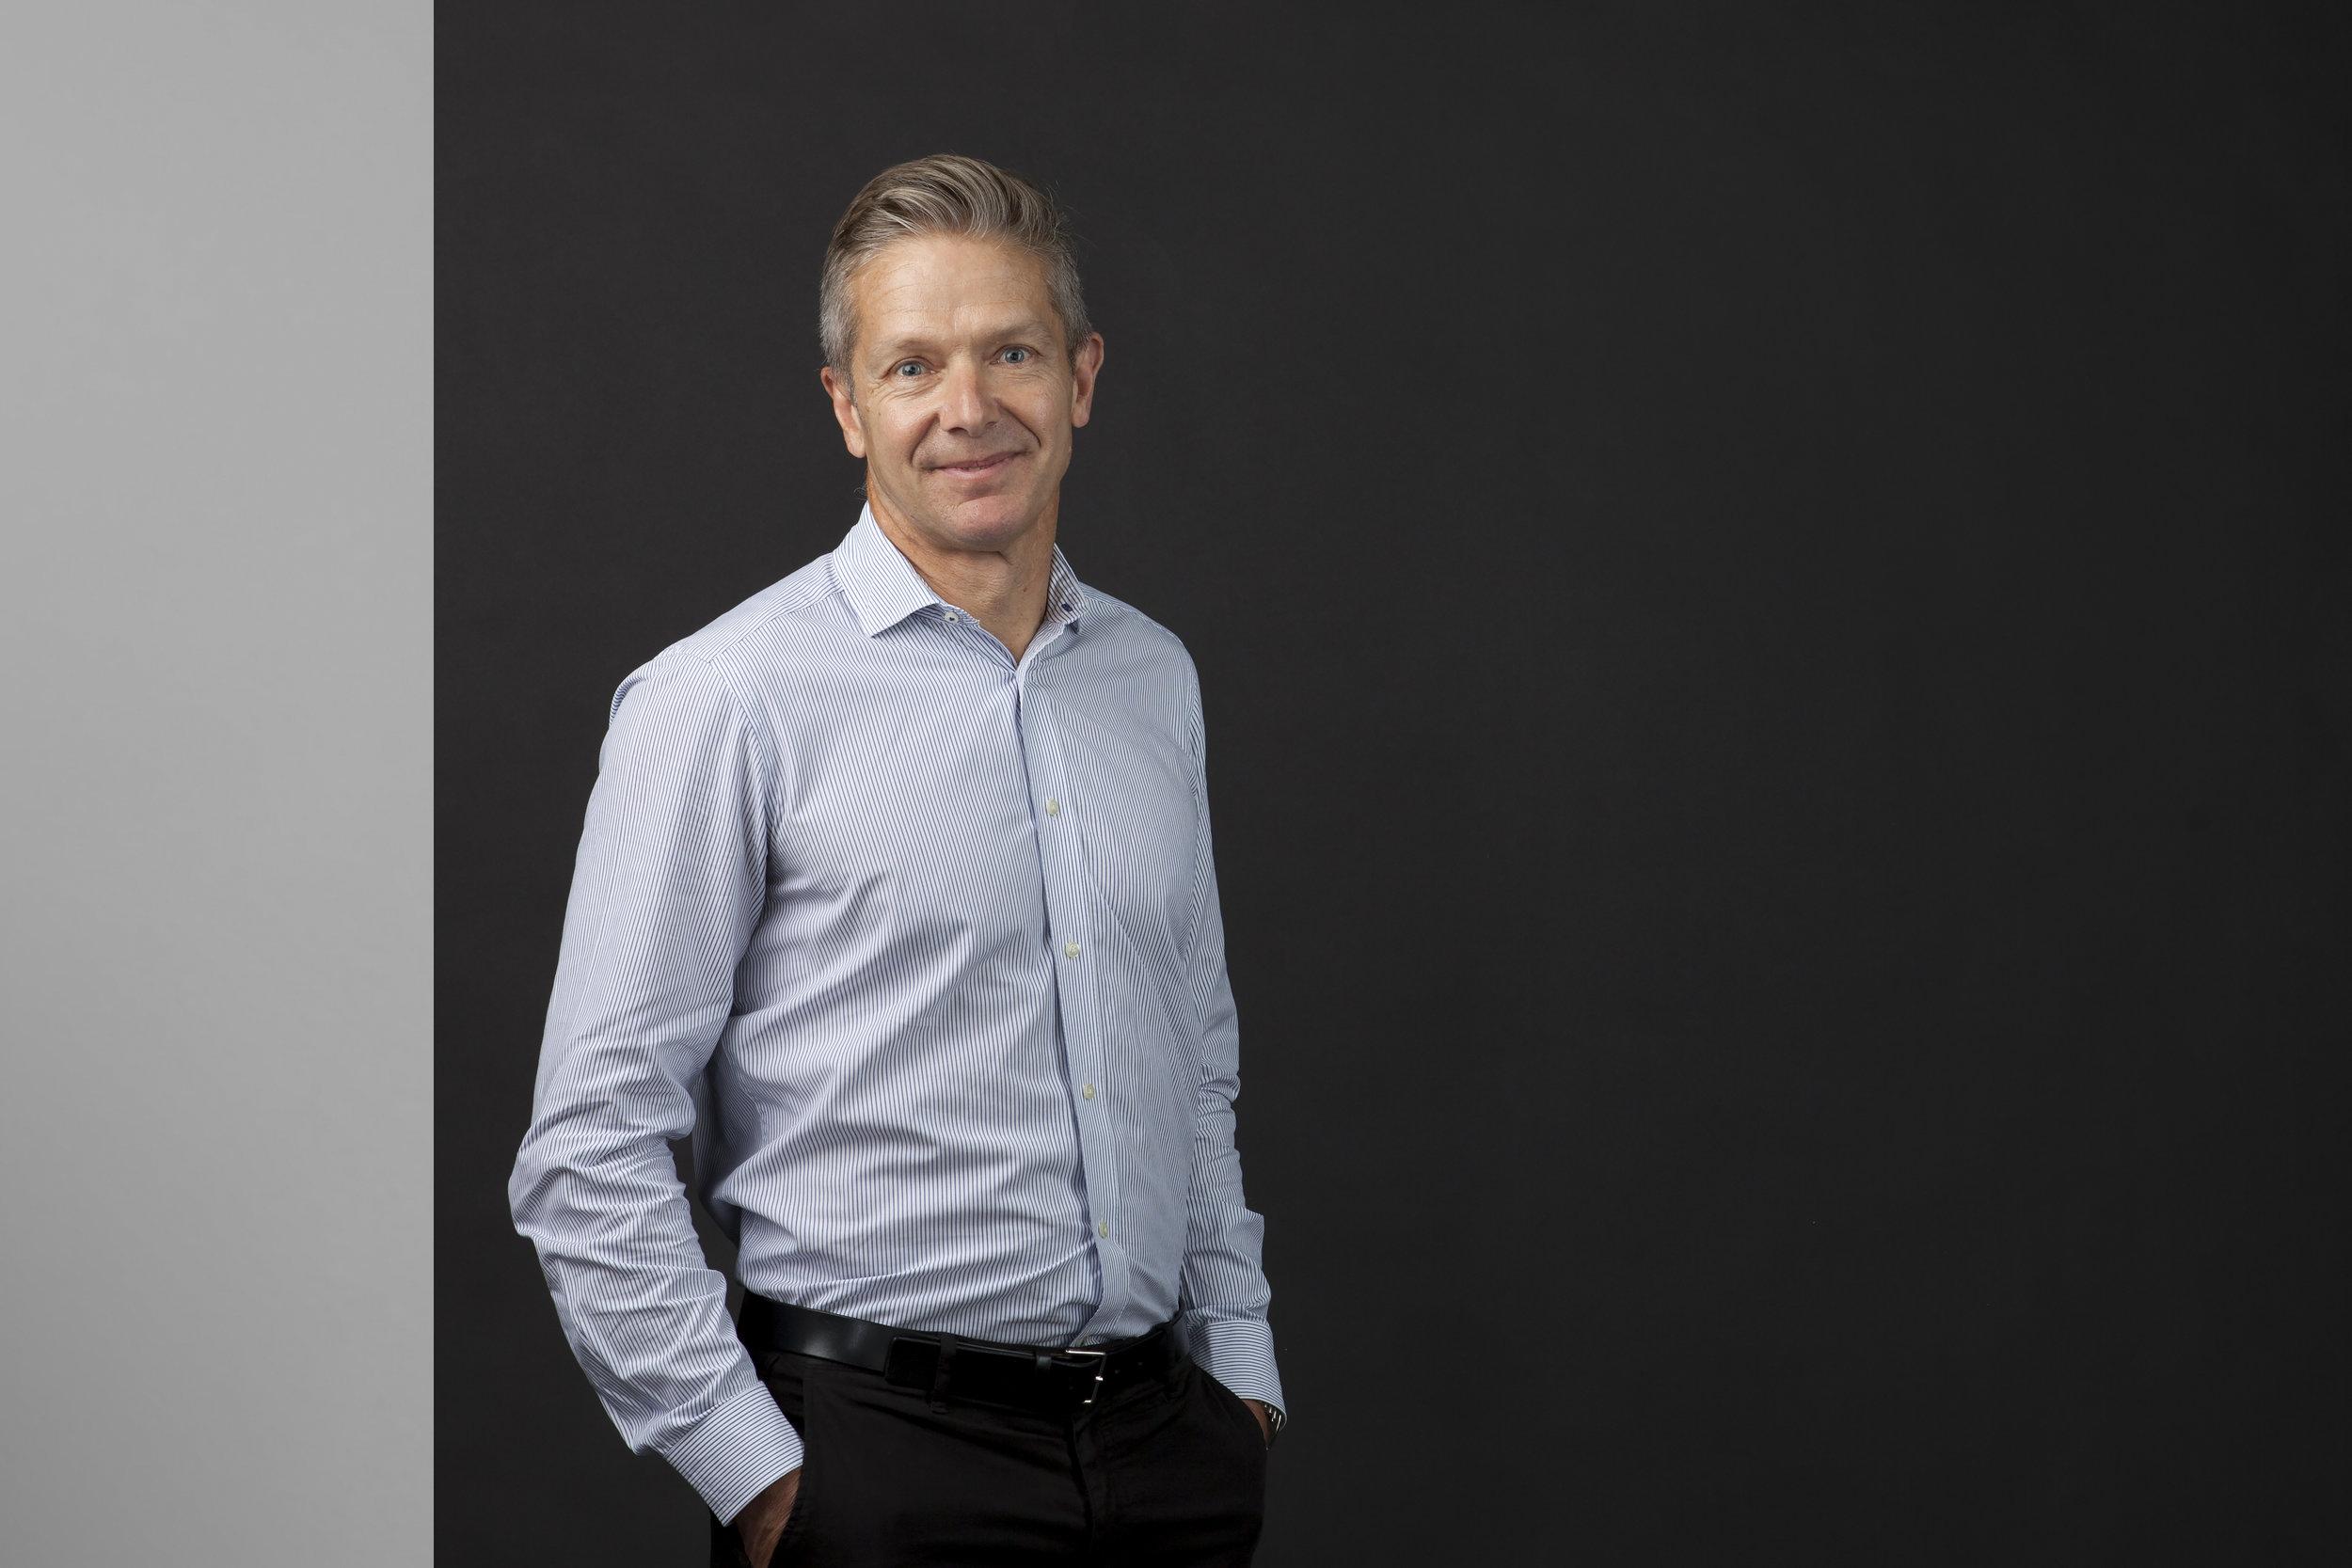 Nigel Dews - Venture Partner at OneVentures, leading Australian Venture Capital firm